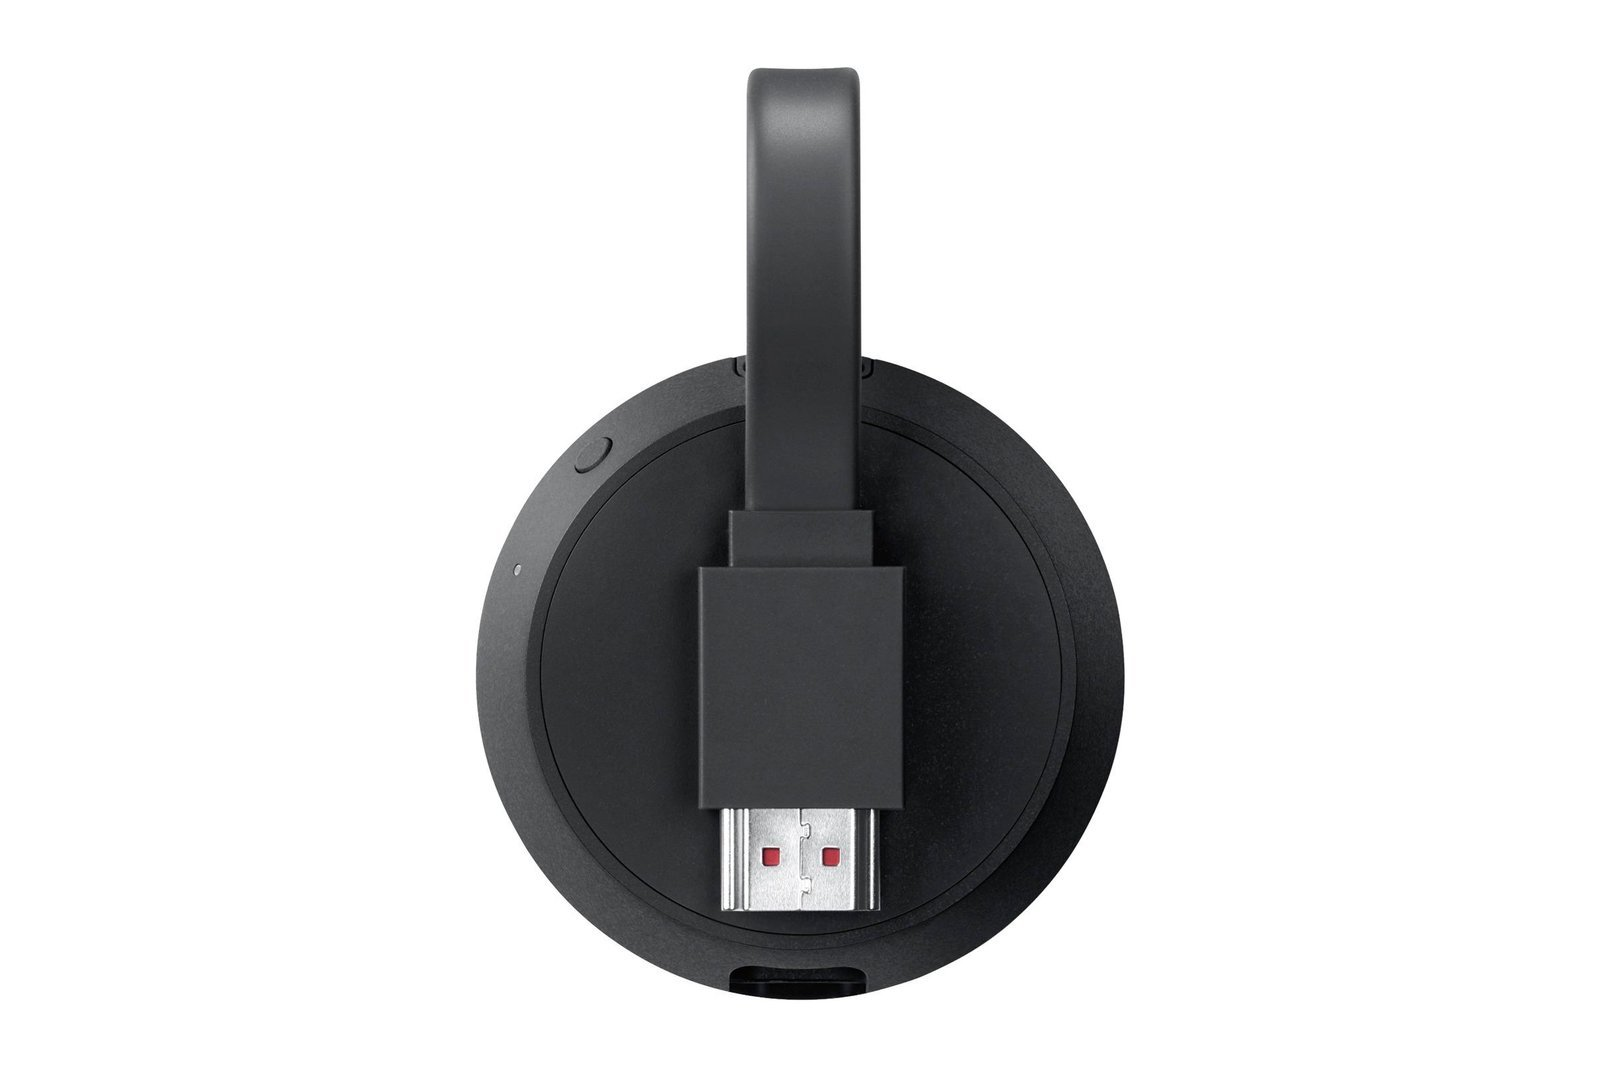 Media Streamer Google Chromecast Ultra 4K SmartTV NC2-6A5-D Charcoal